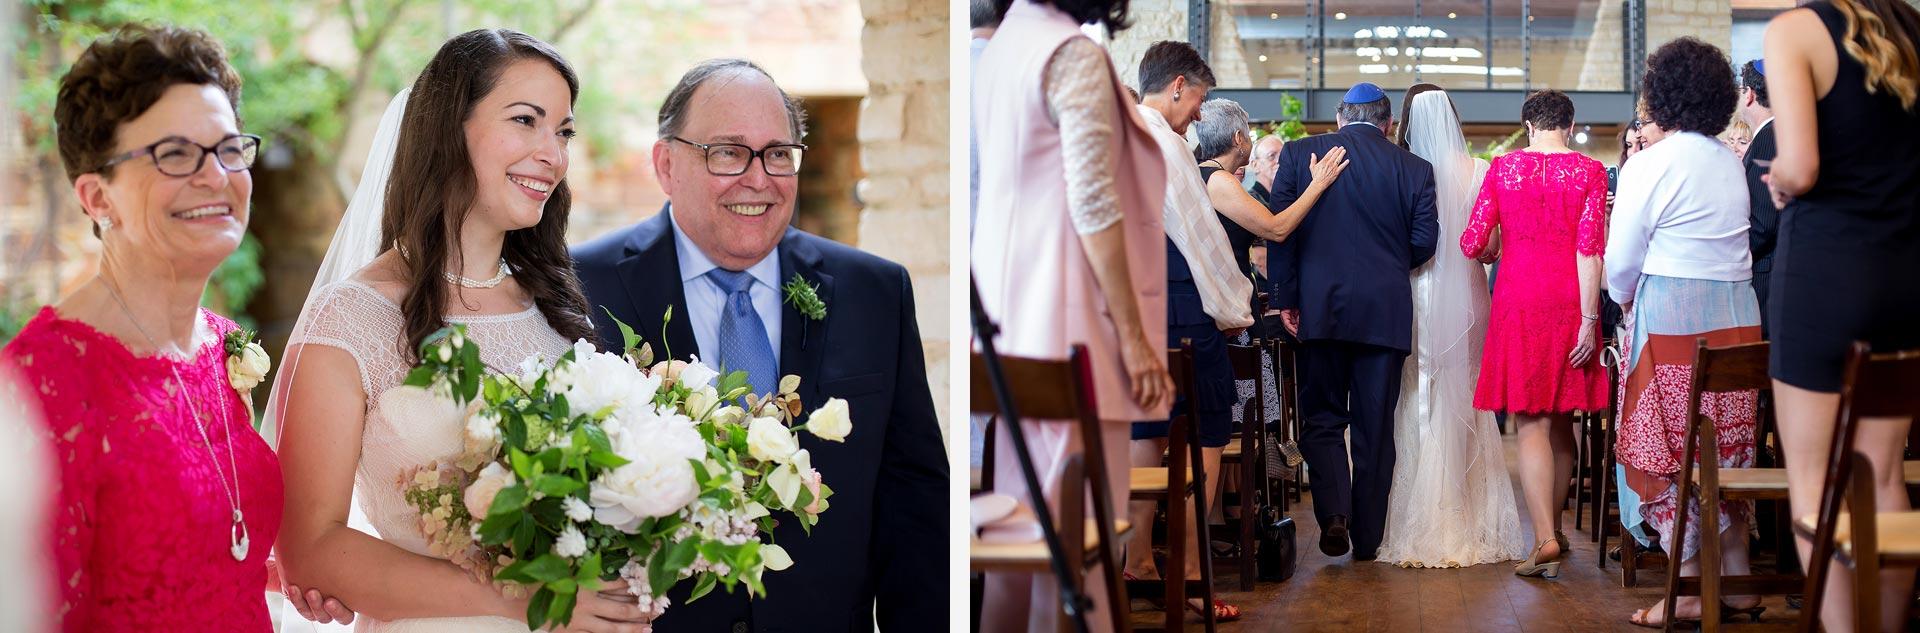 Wildflower Center Wedding Photographers